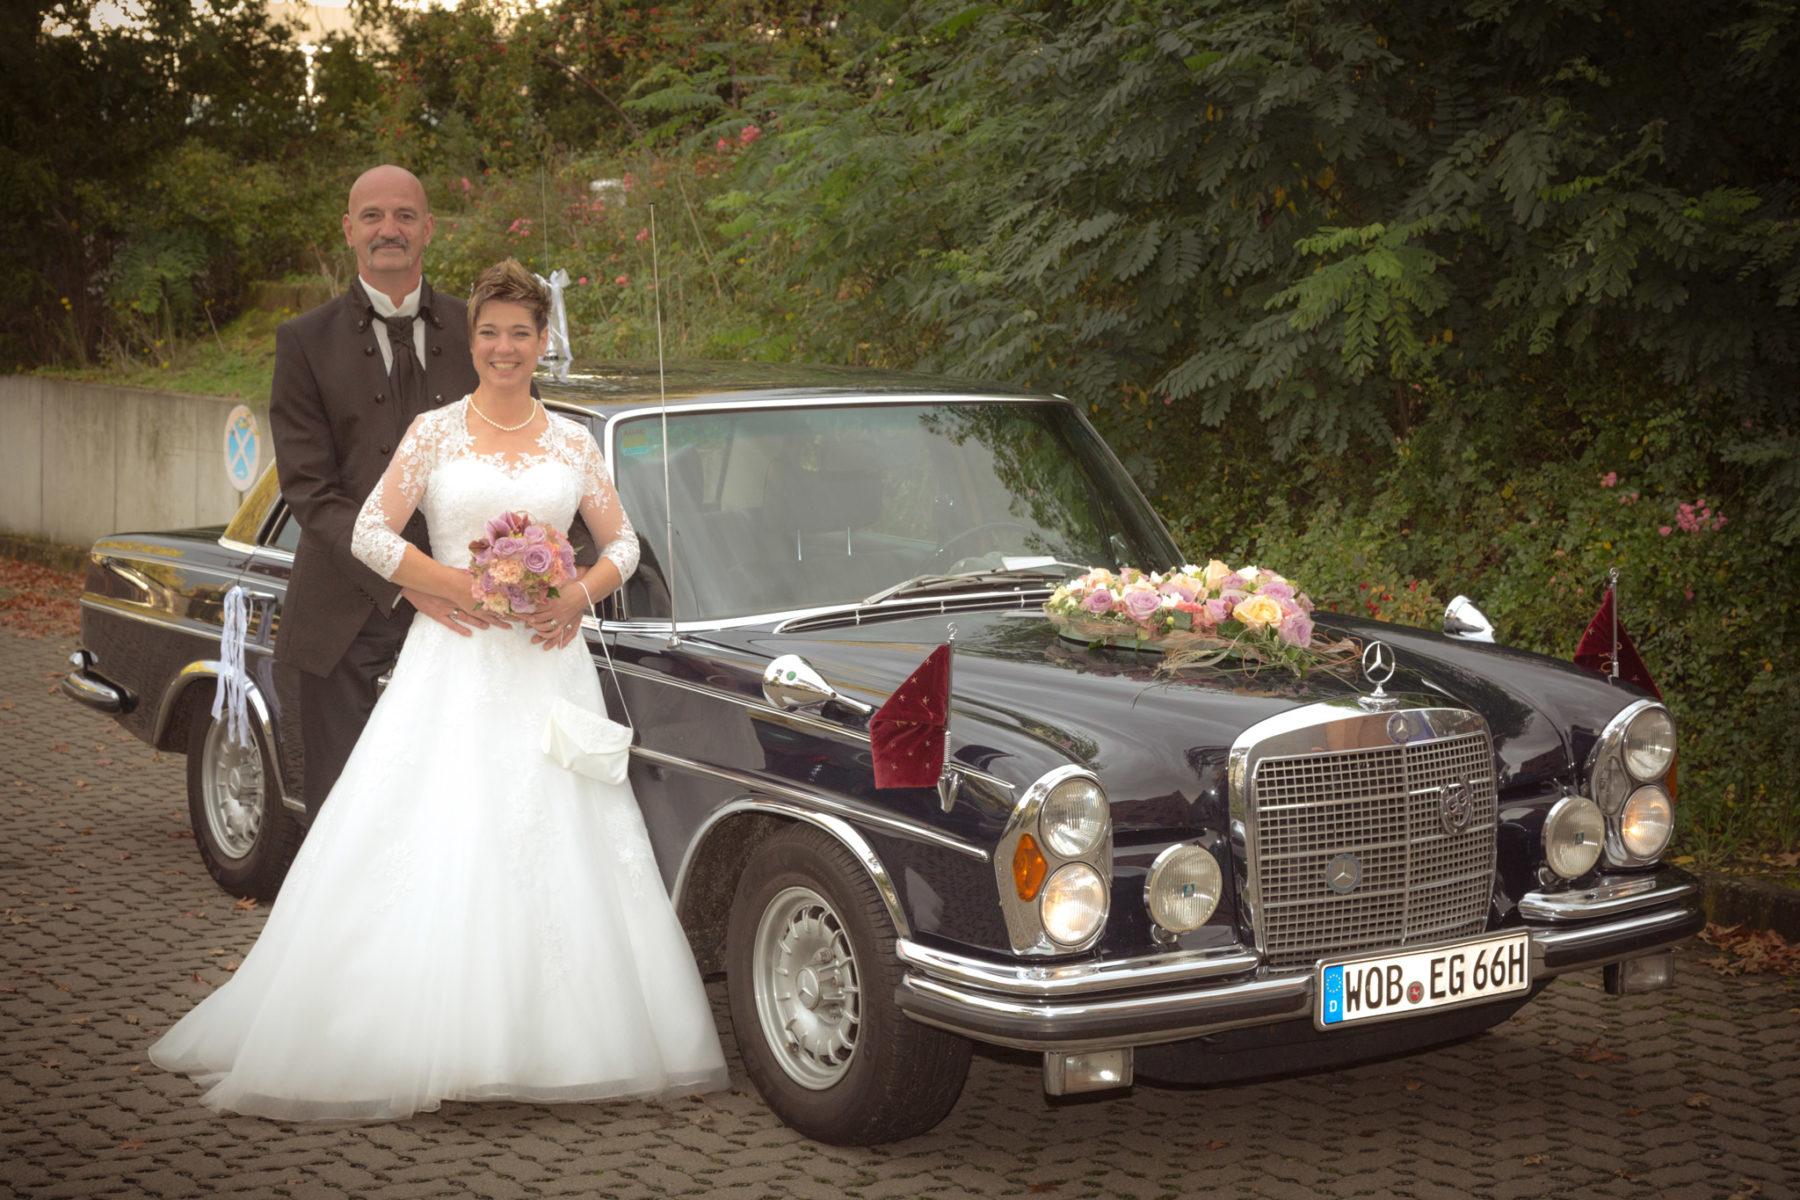 Hochzeitspaar Carmen & Frank Risch